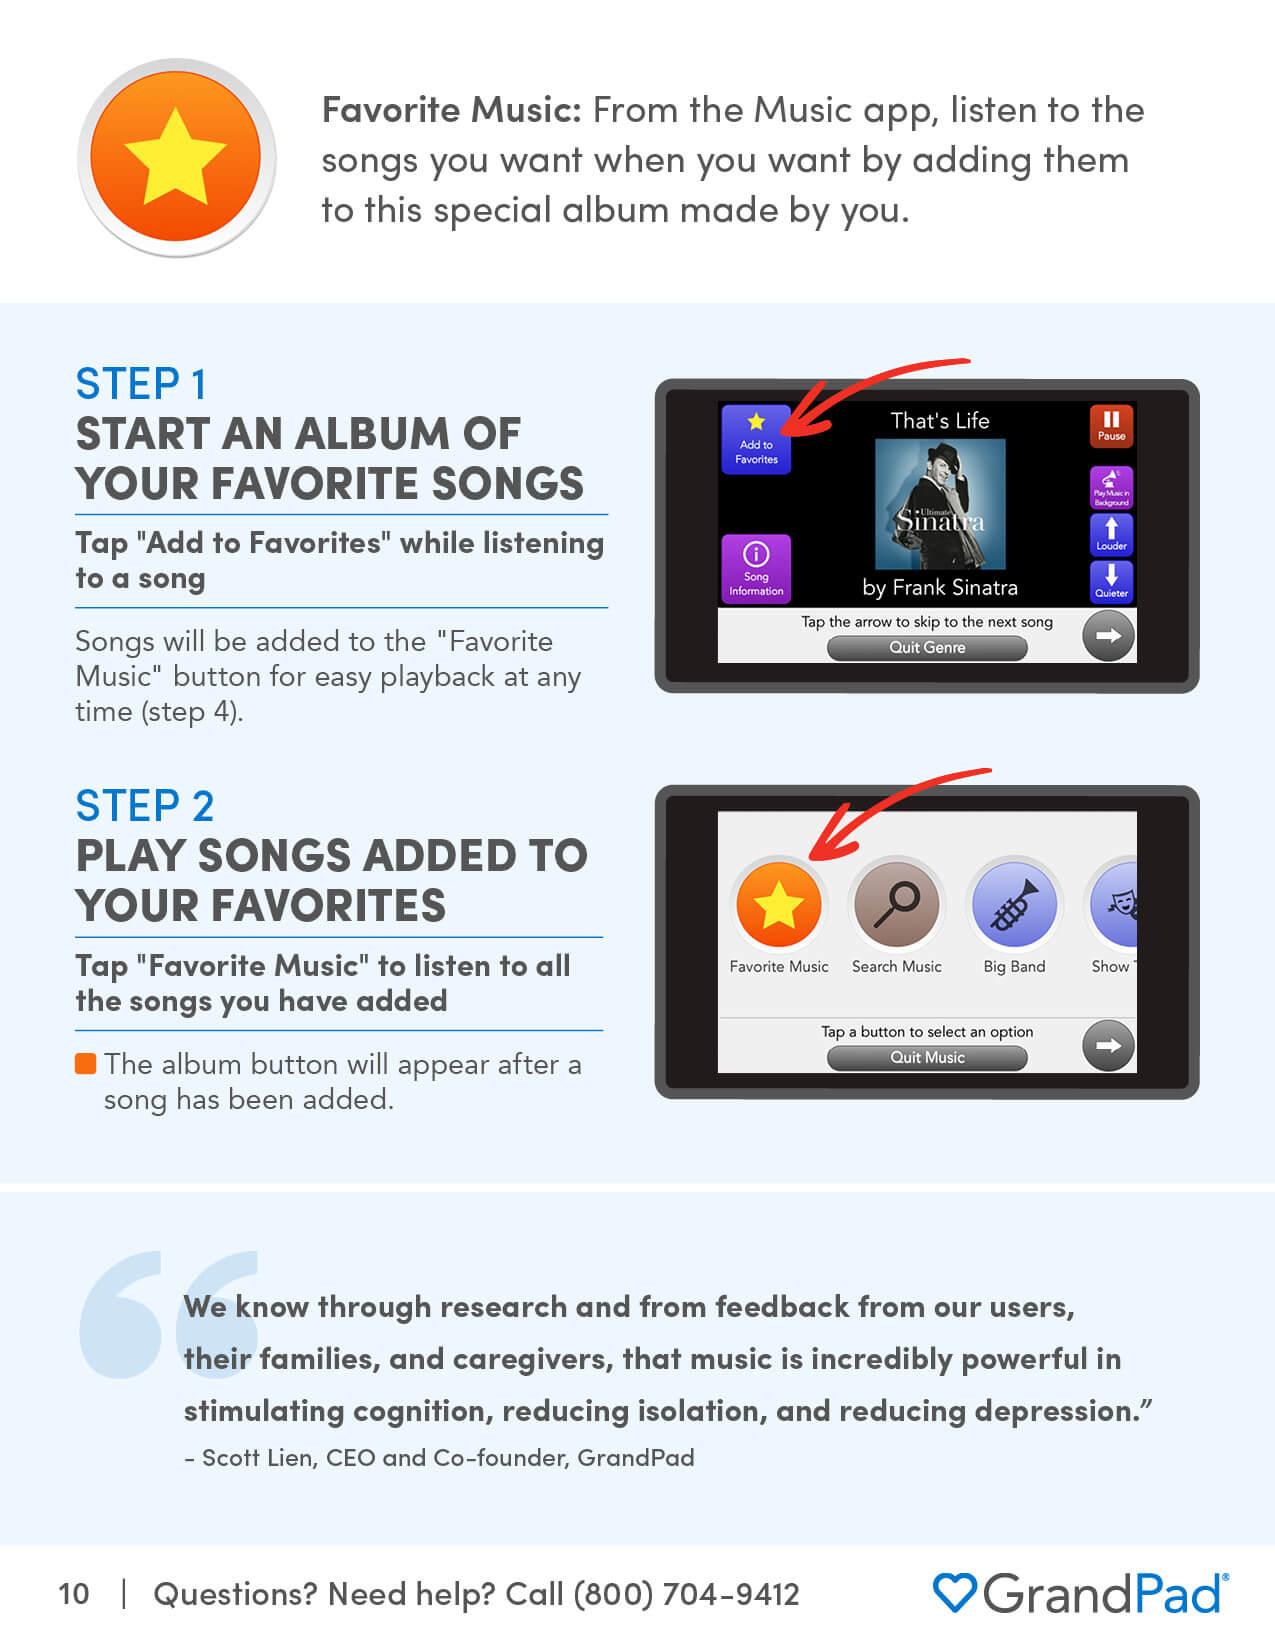 Instruction on using the Favorite Music album